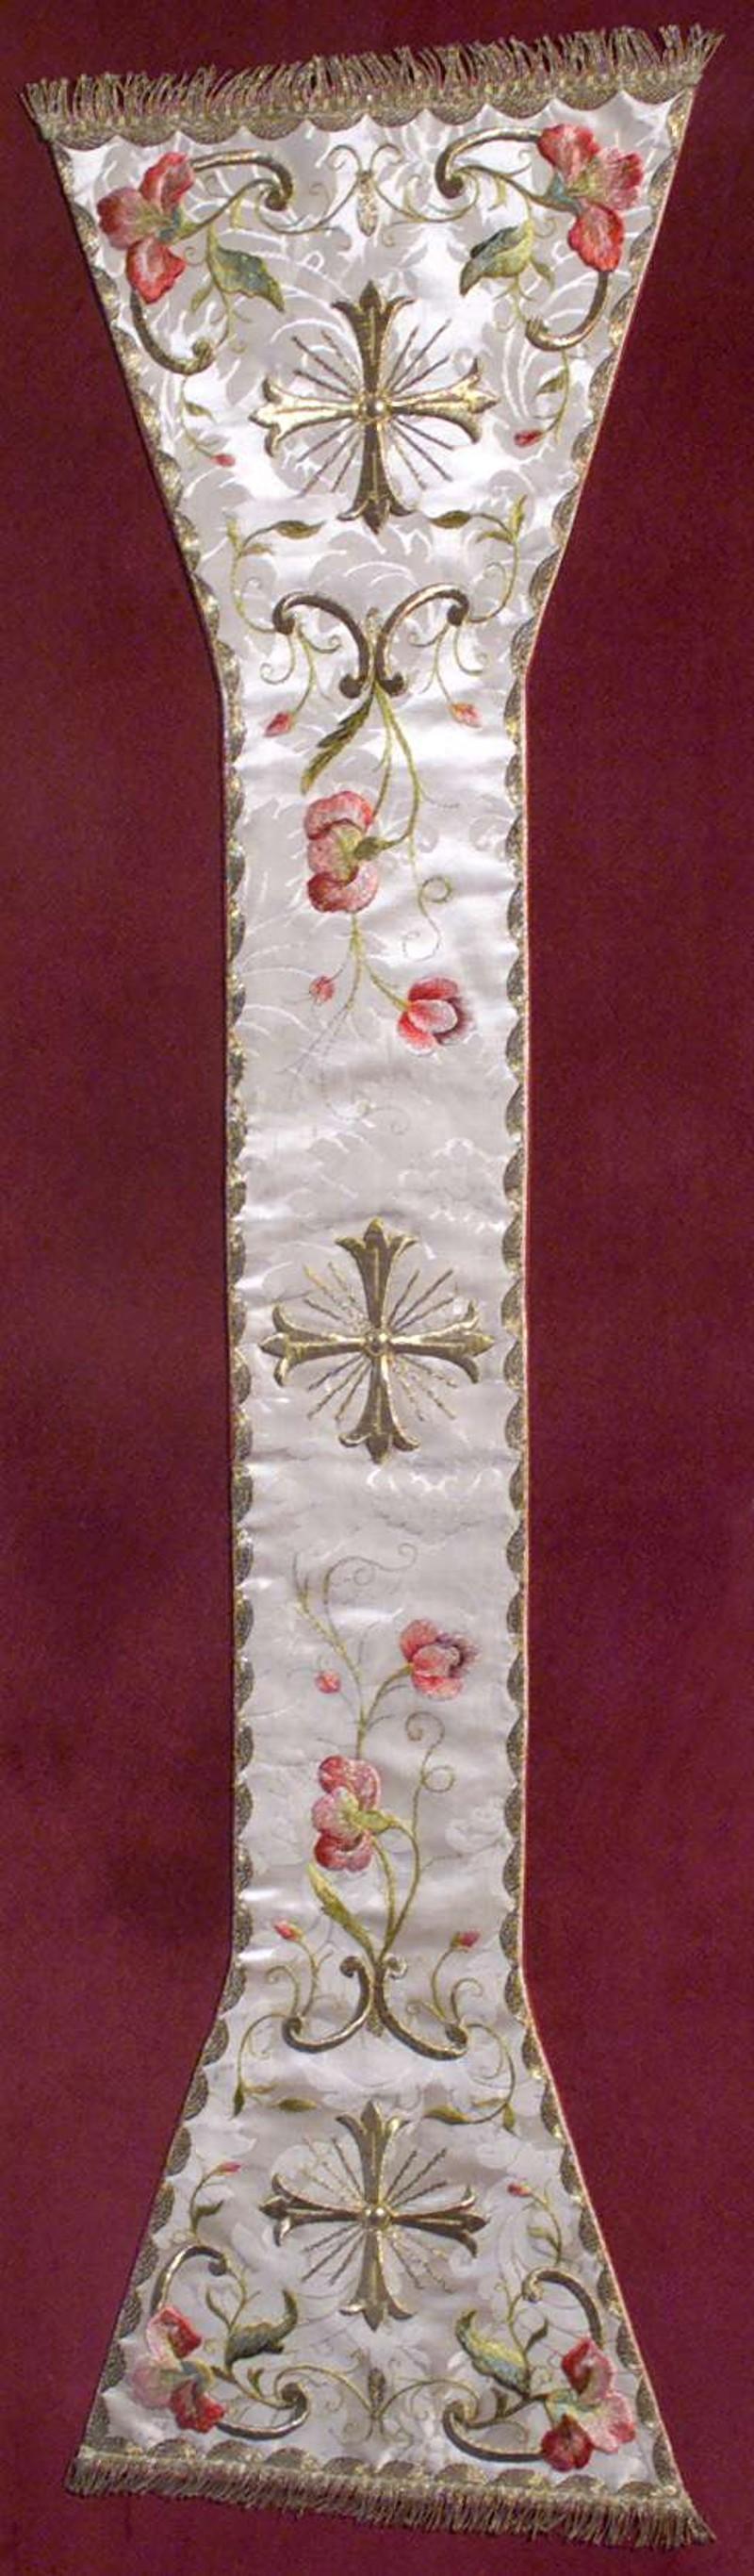 Manifattura lombarda sec. XVIII, Manipolo bianco in damasco ricamato 2/2